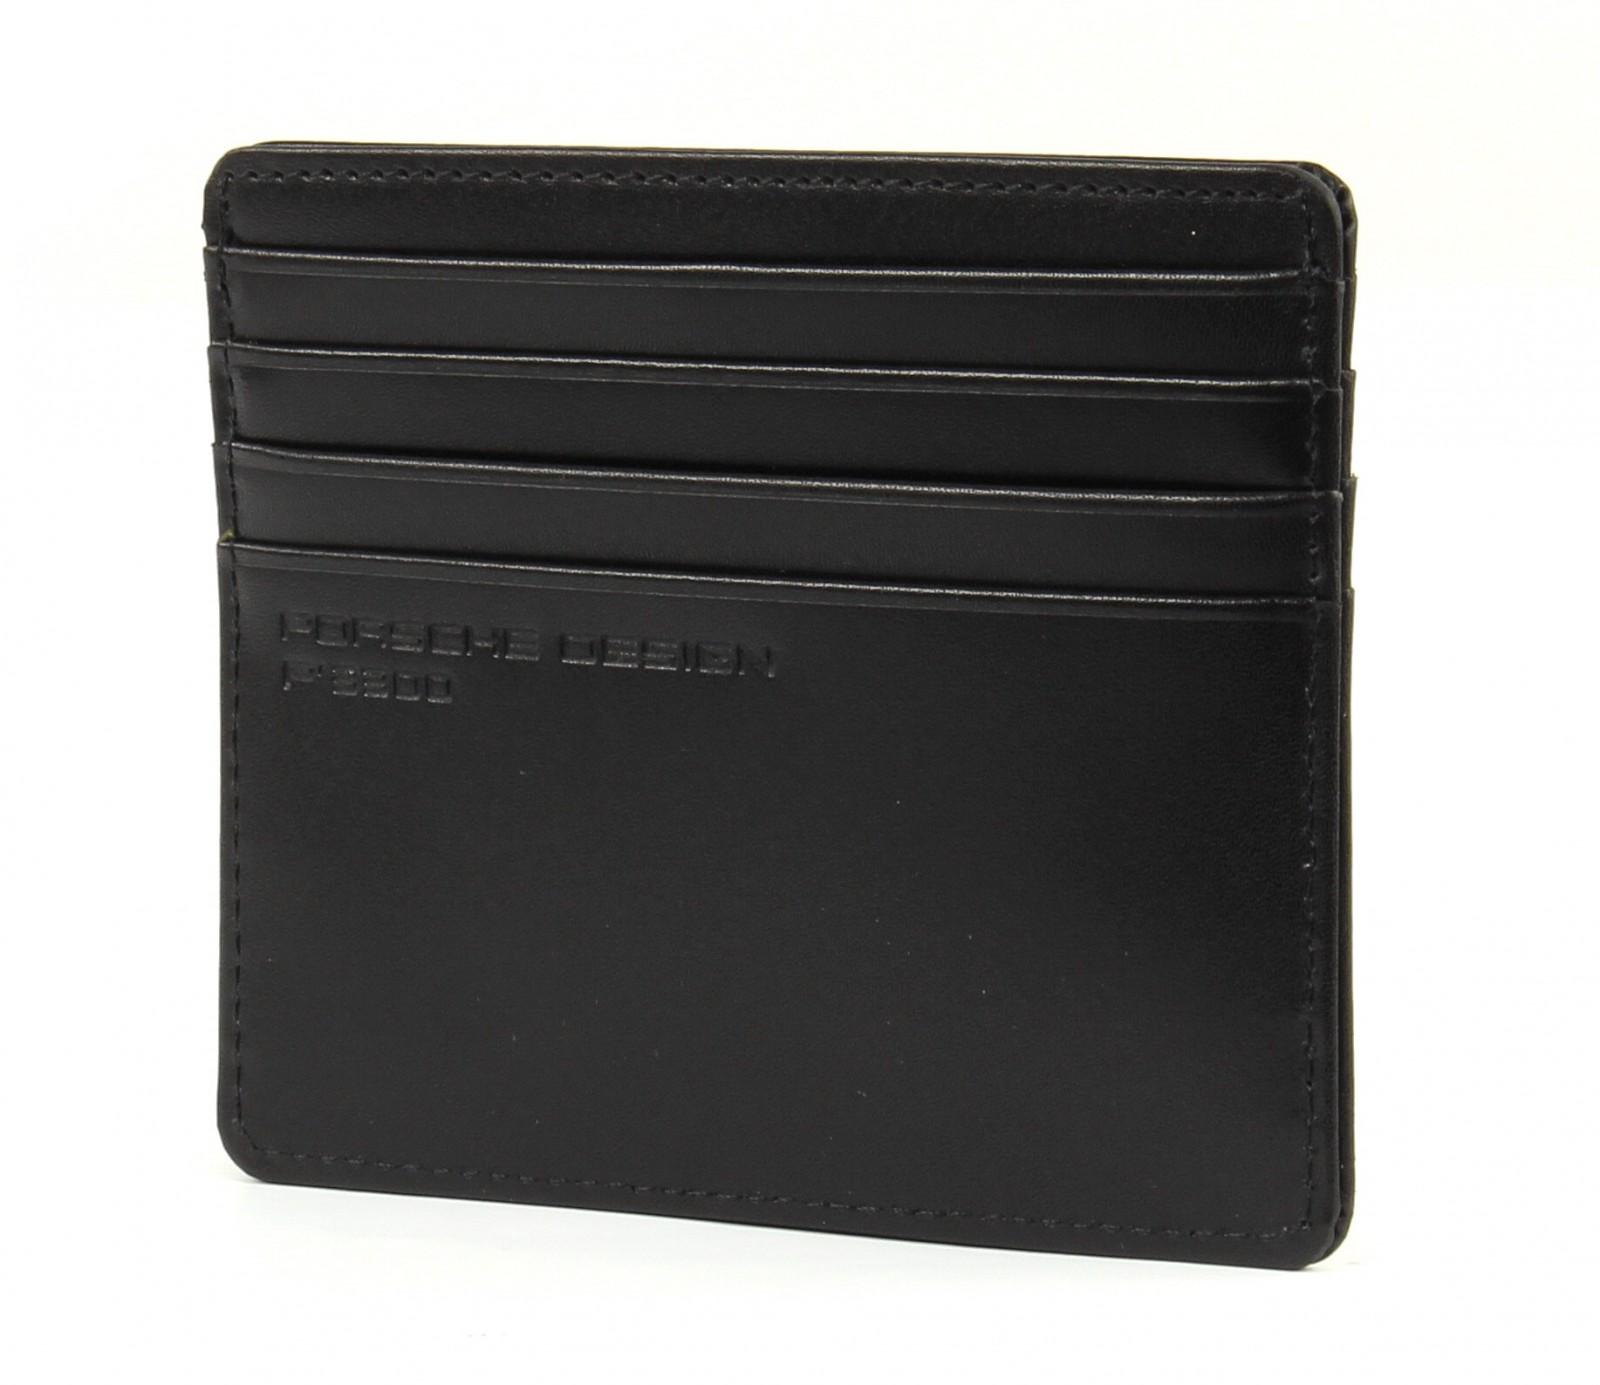 PORSCHE DESIGN Classic Line 2.1 Card Holder SH8 Black